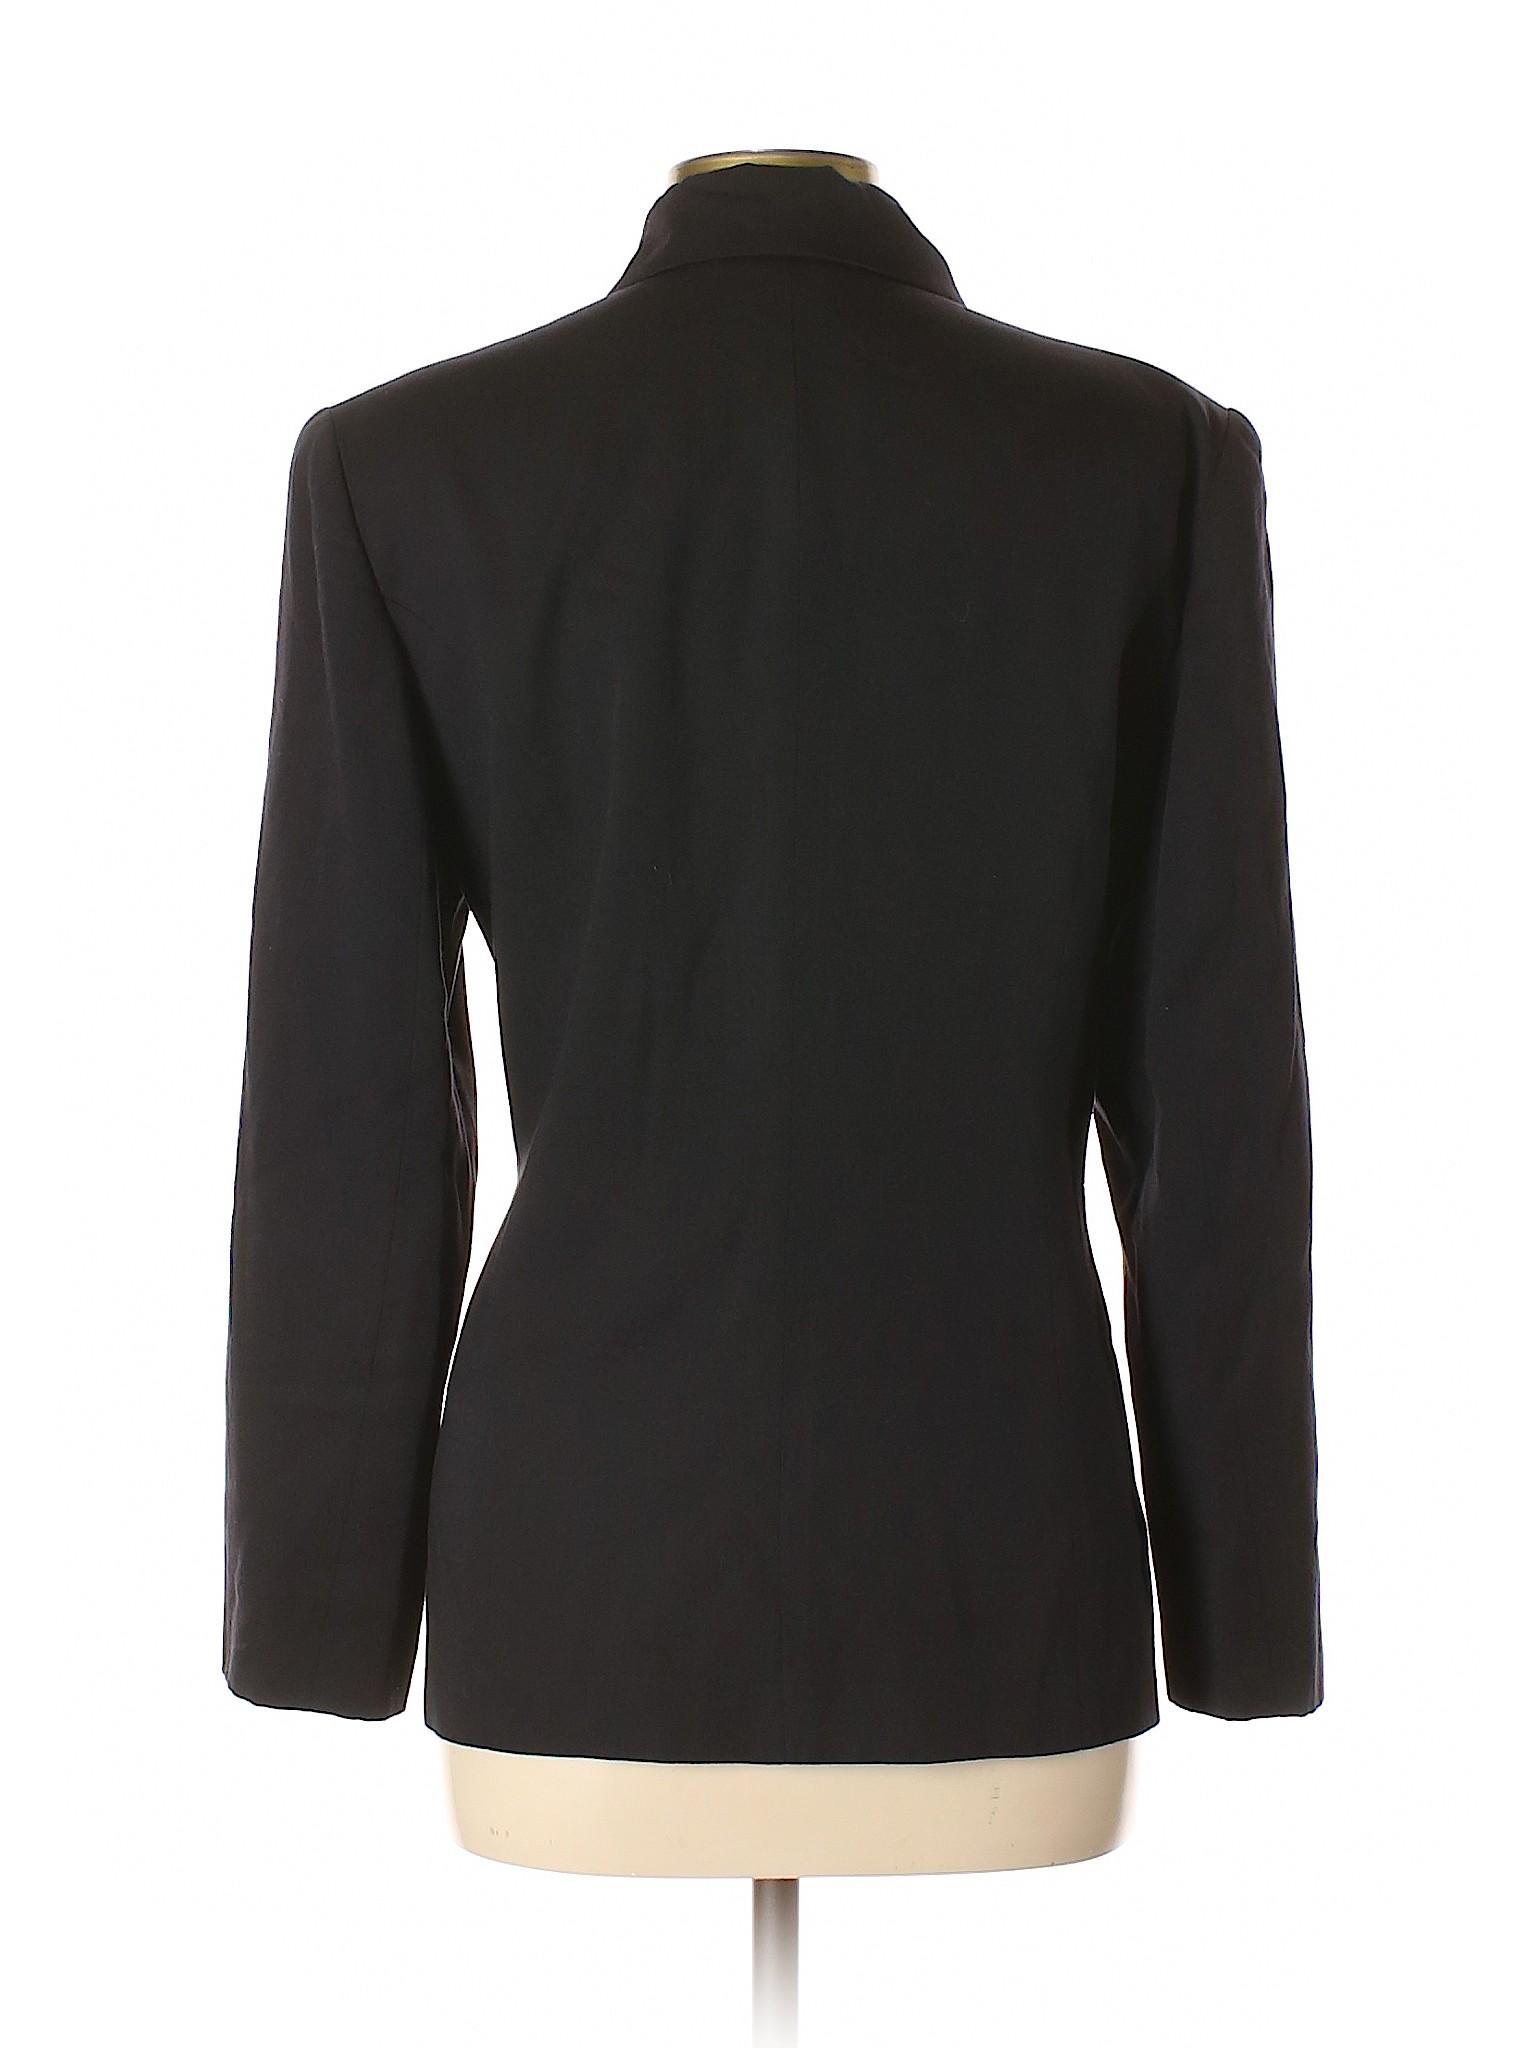 leisure LOFT Ann Jacket Boutique Taylor B7qfwqYd